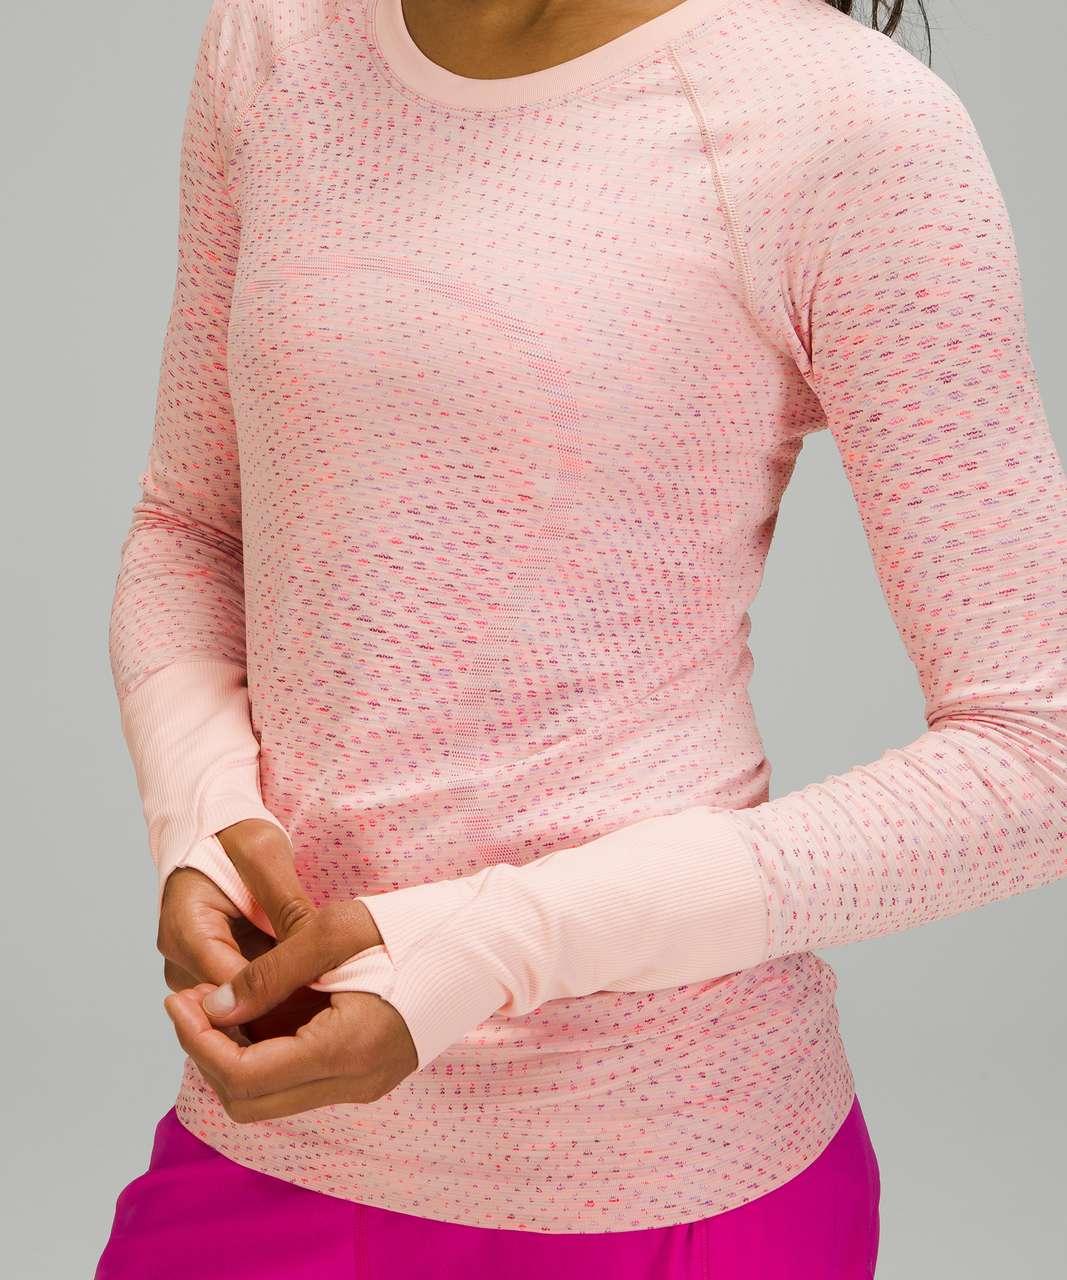 Lululemon Swiftly Tech Long Sleeve 2.0 - Grid Warp Pink Mist / Sonic Pink Multi